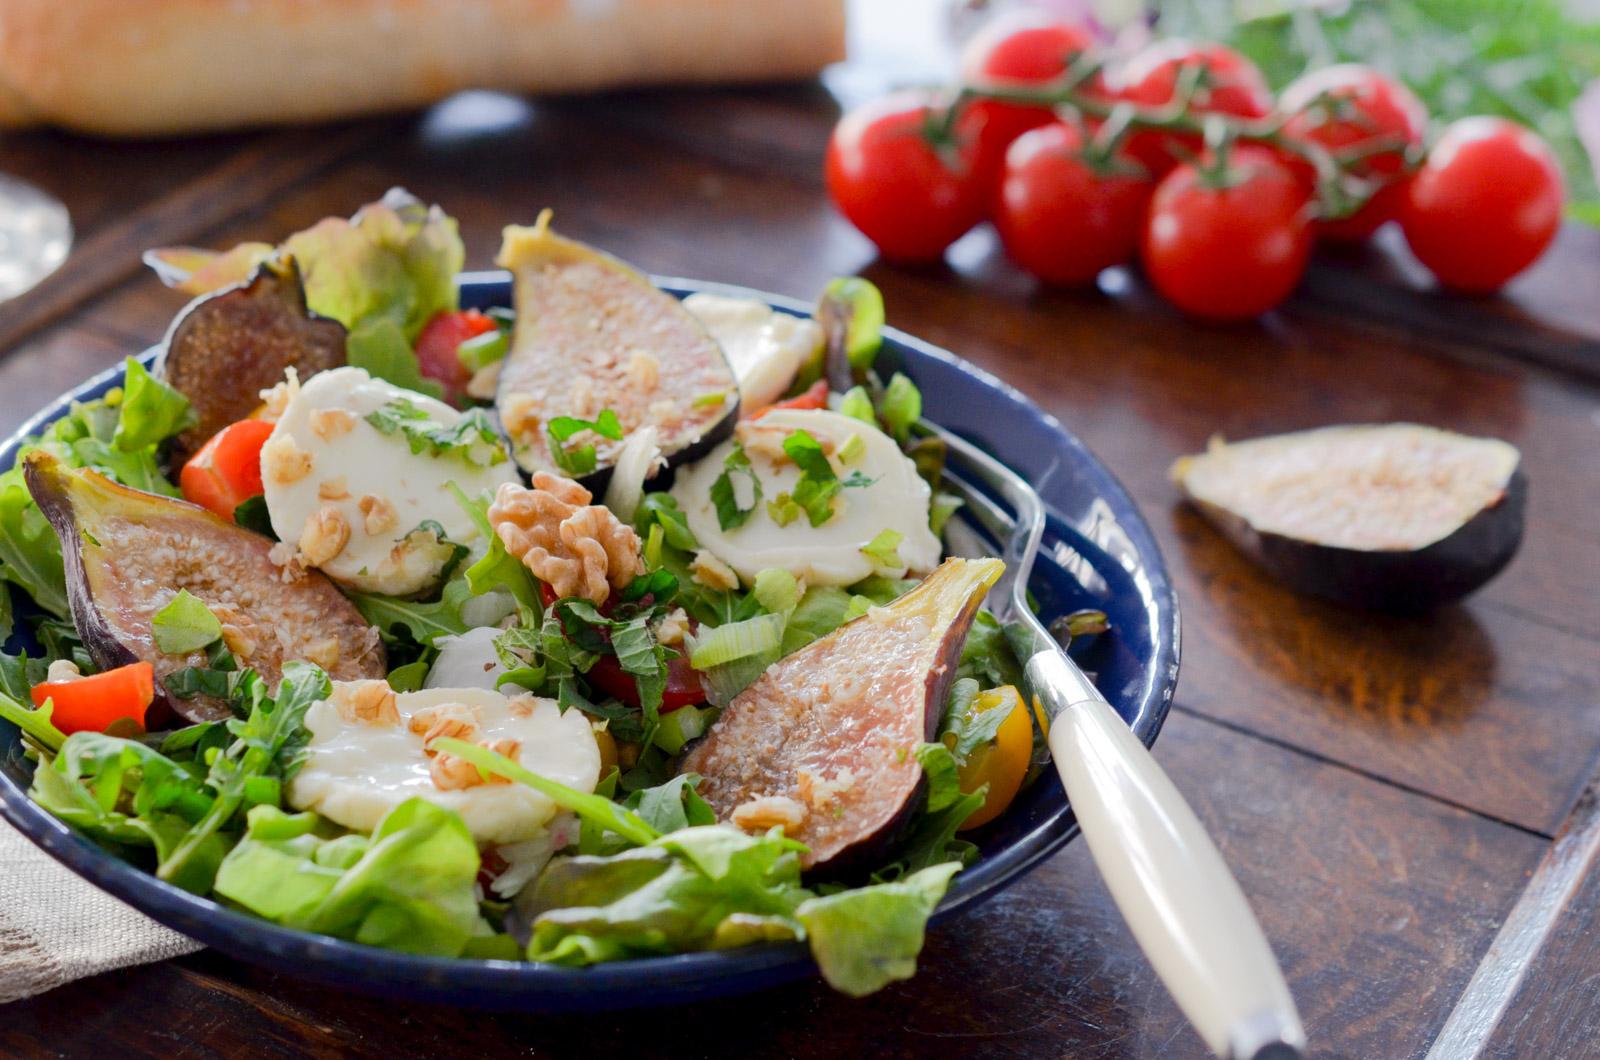 Salade Figue Chevre (6 Sur 7)